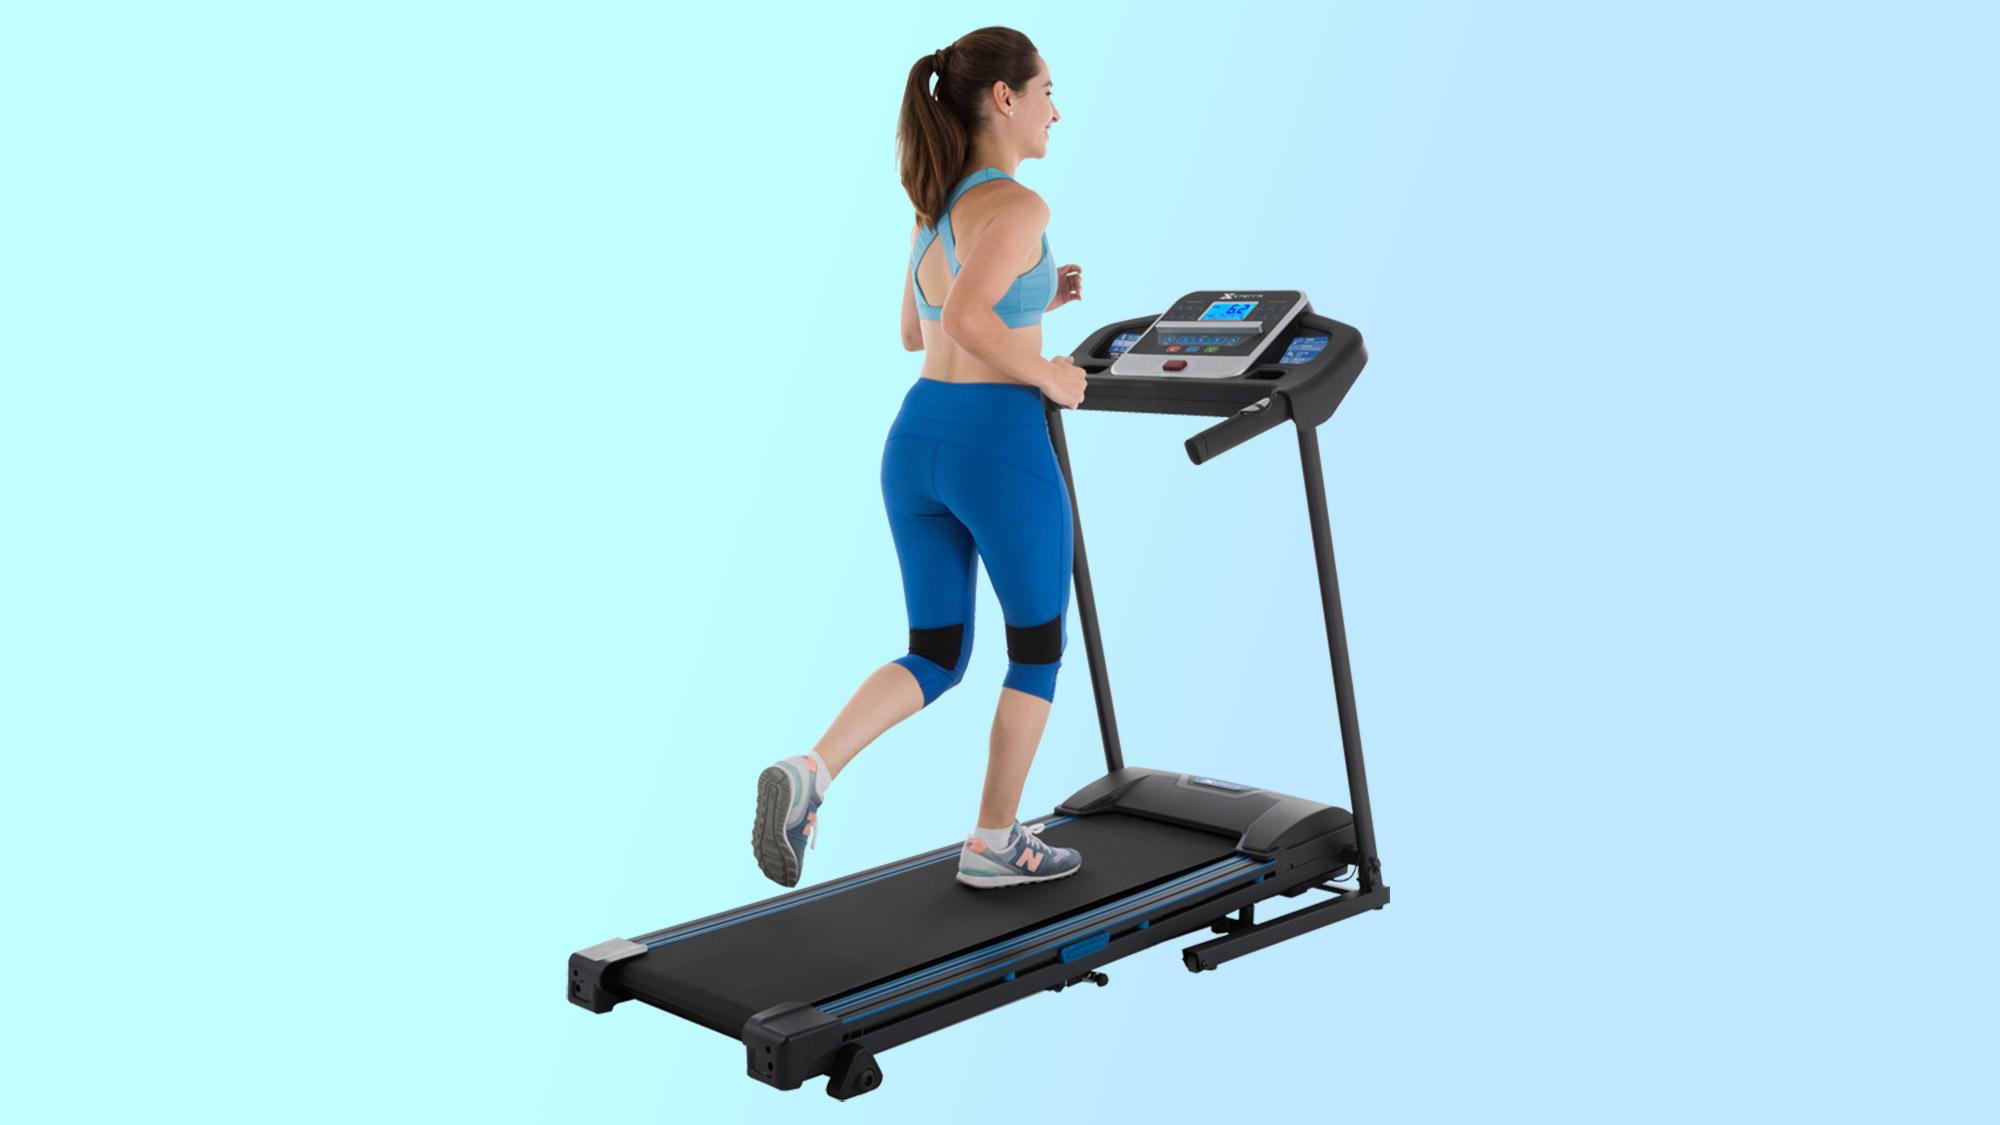 Best home gym equipment: Xterra Fitness TR200 Folding Treadmill